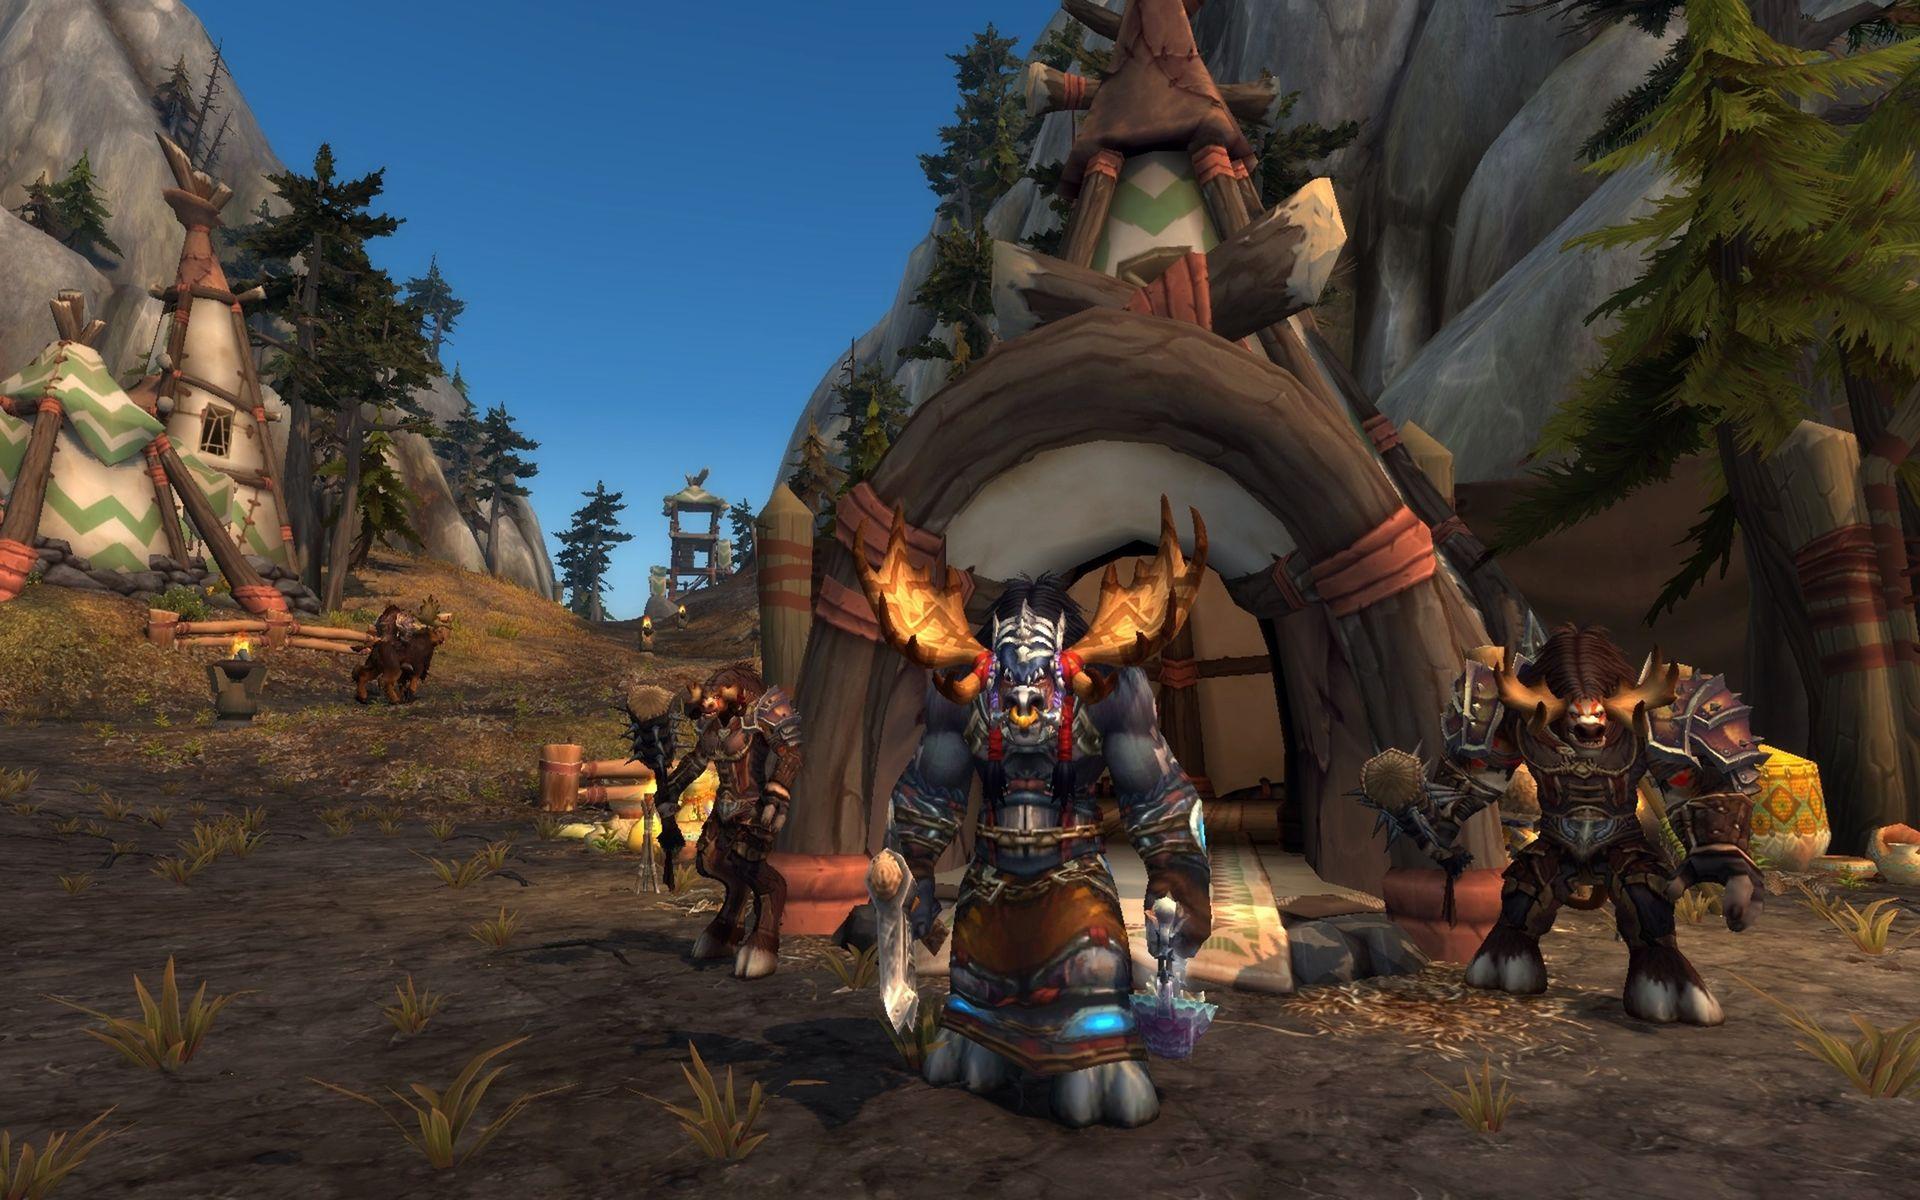 world-of-warcraft-screenshot-26